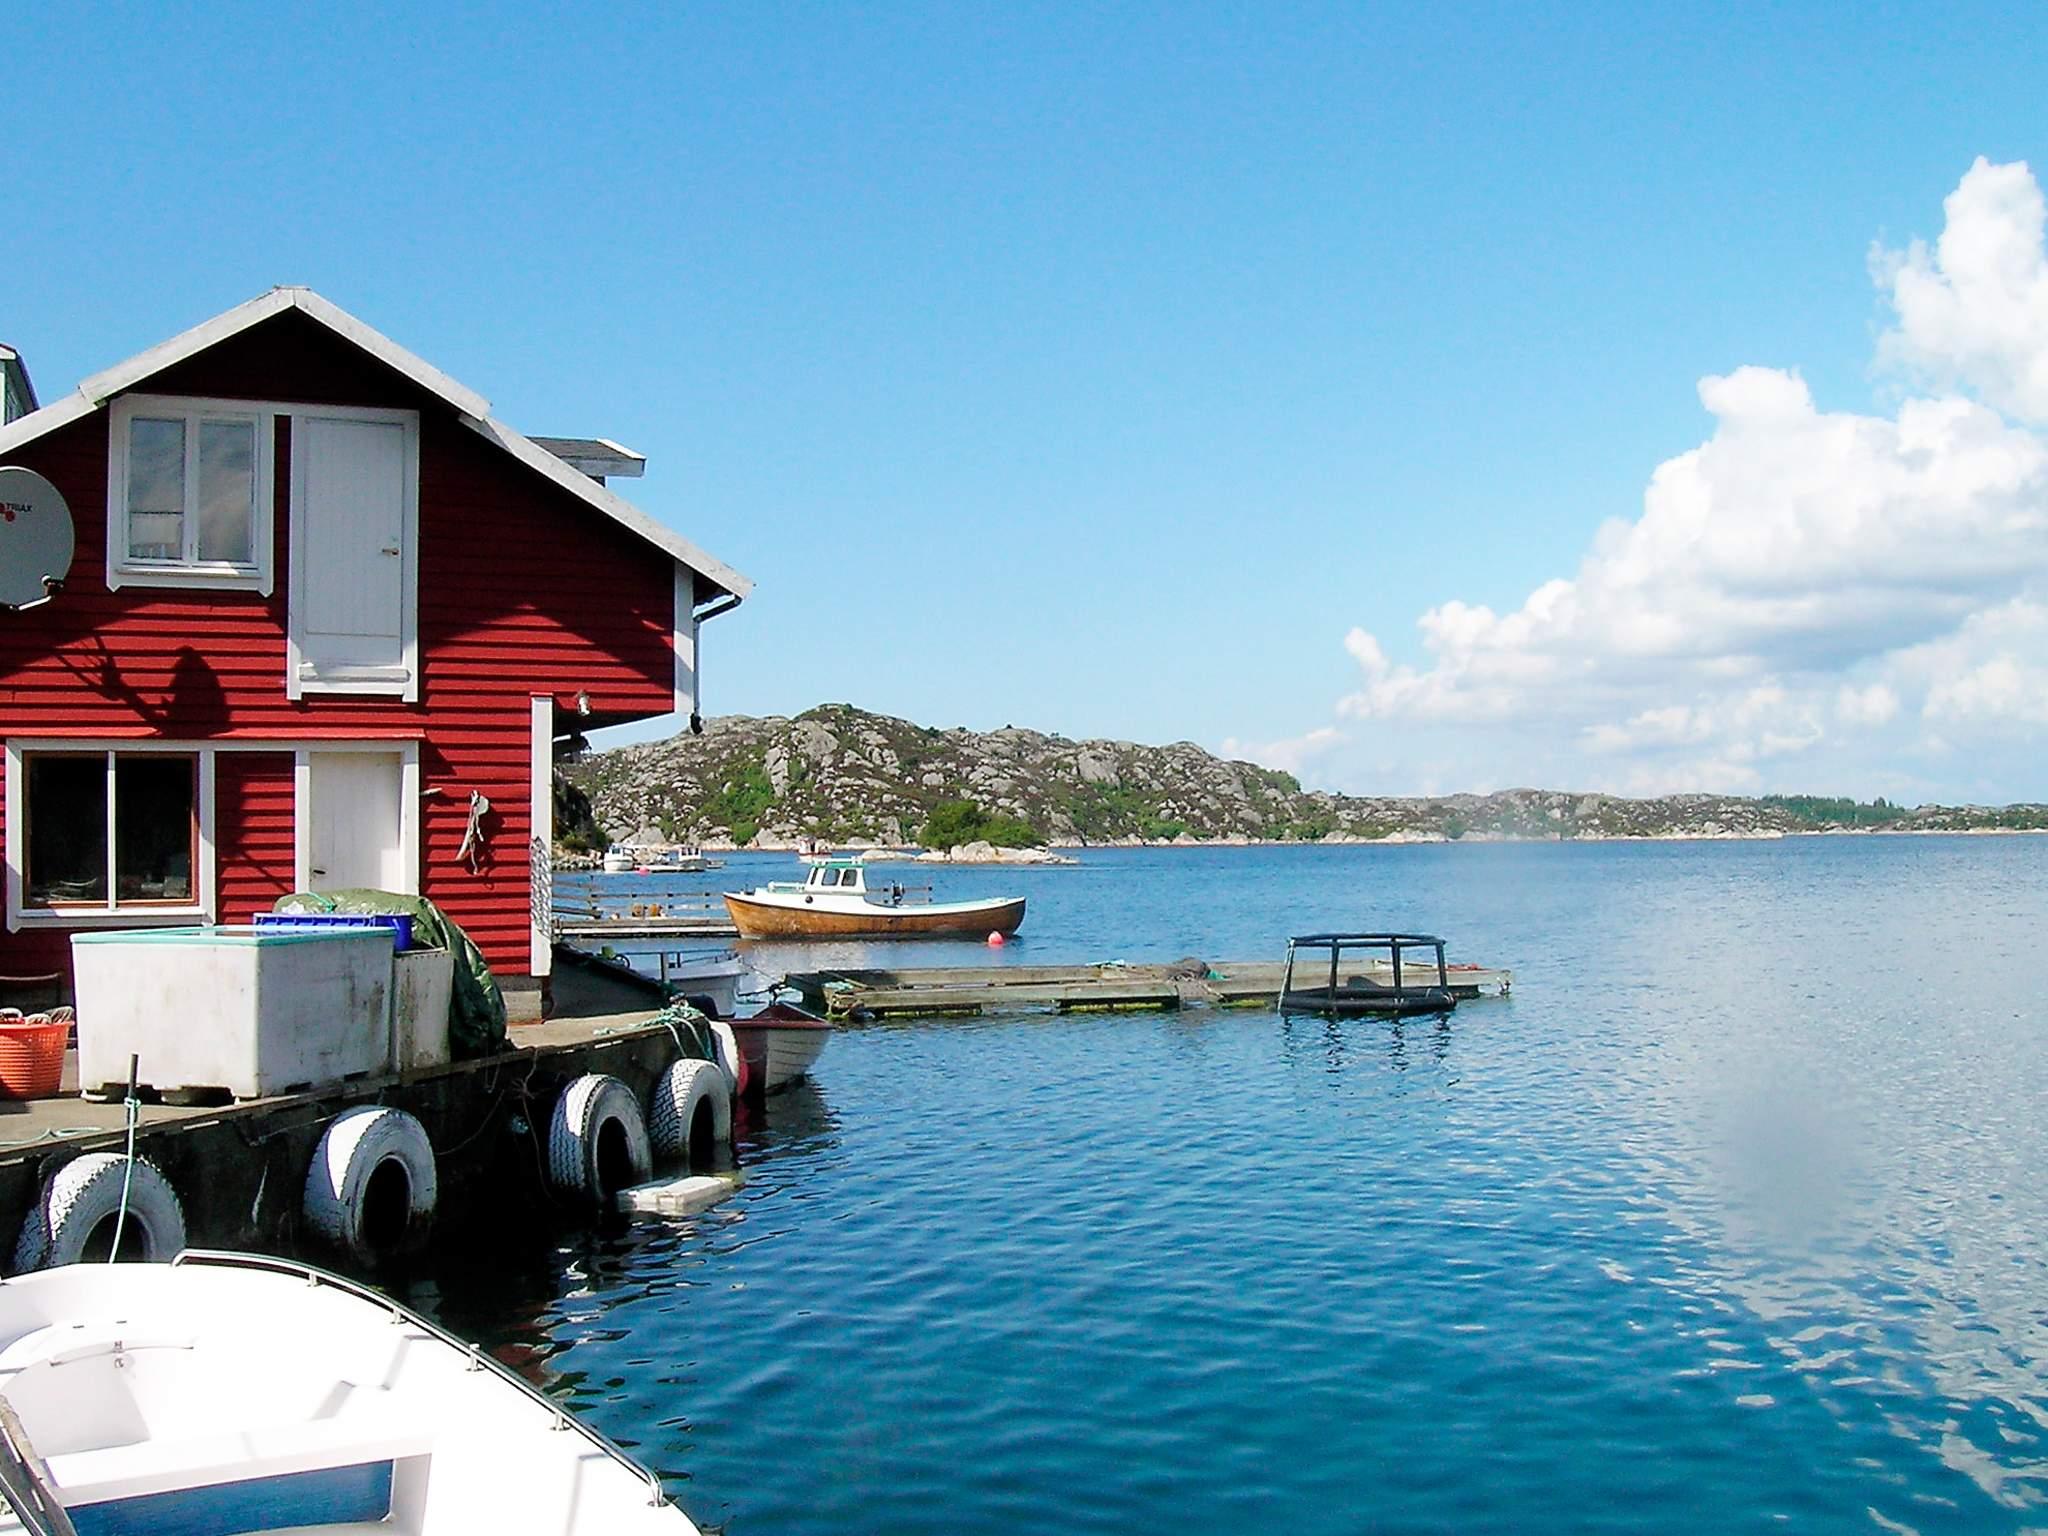 Ferienhaus Rolvsnes (84345), Rubbestadneset, Hordaland - Hardangerfjord, Westnorwegen, Norwegen, Bild 14